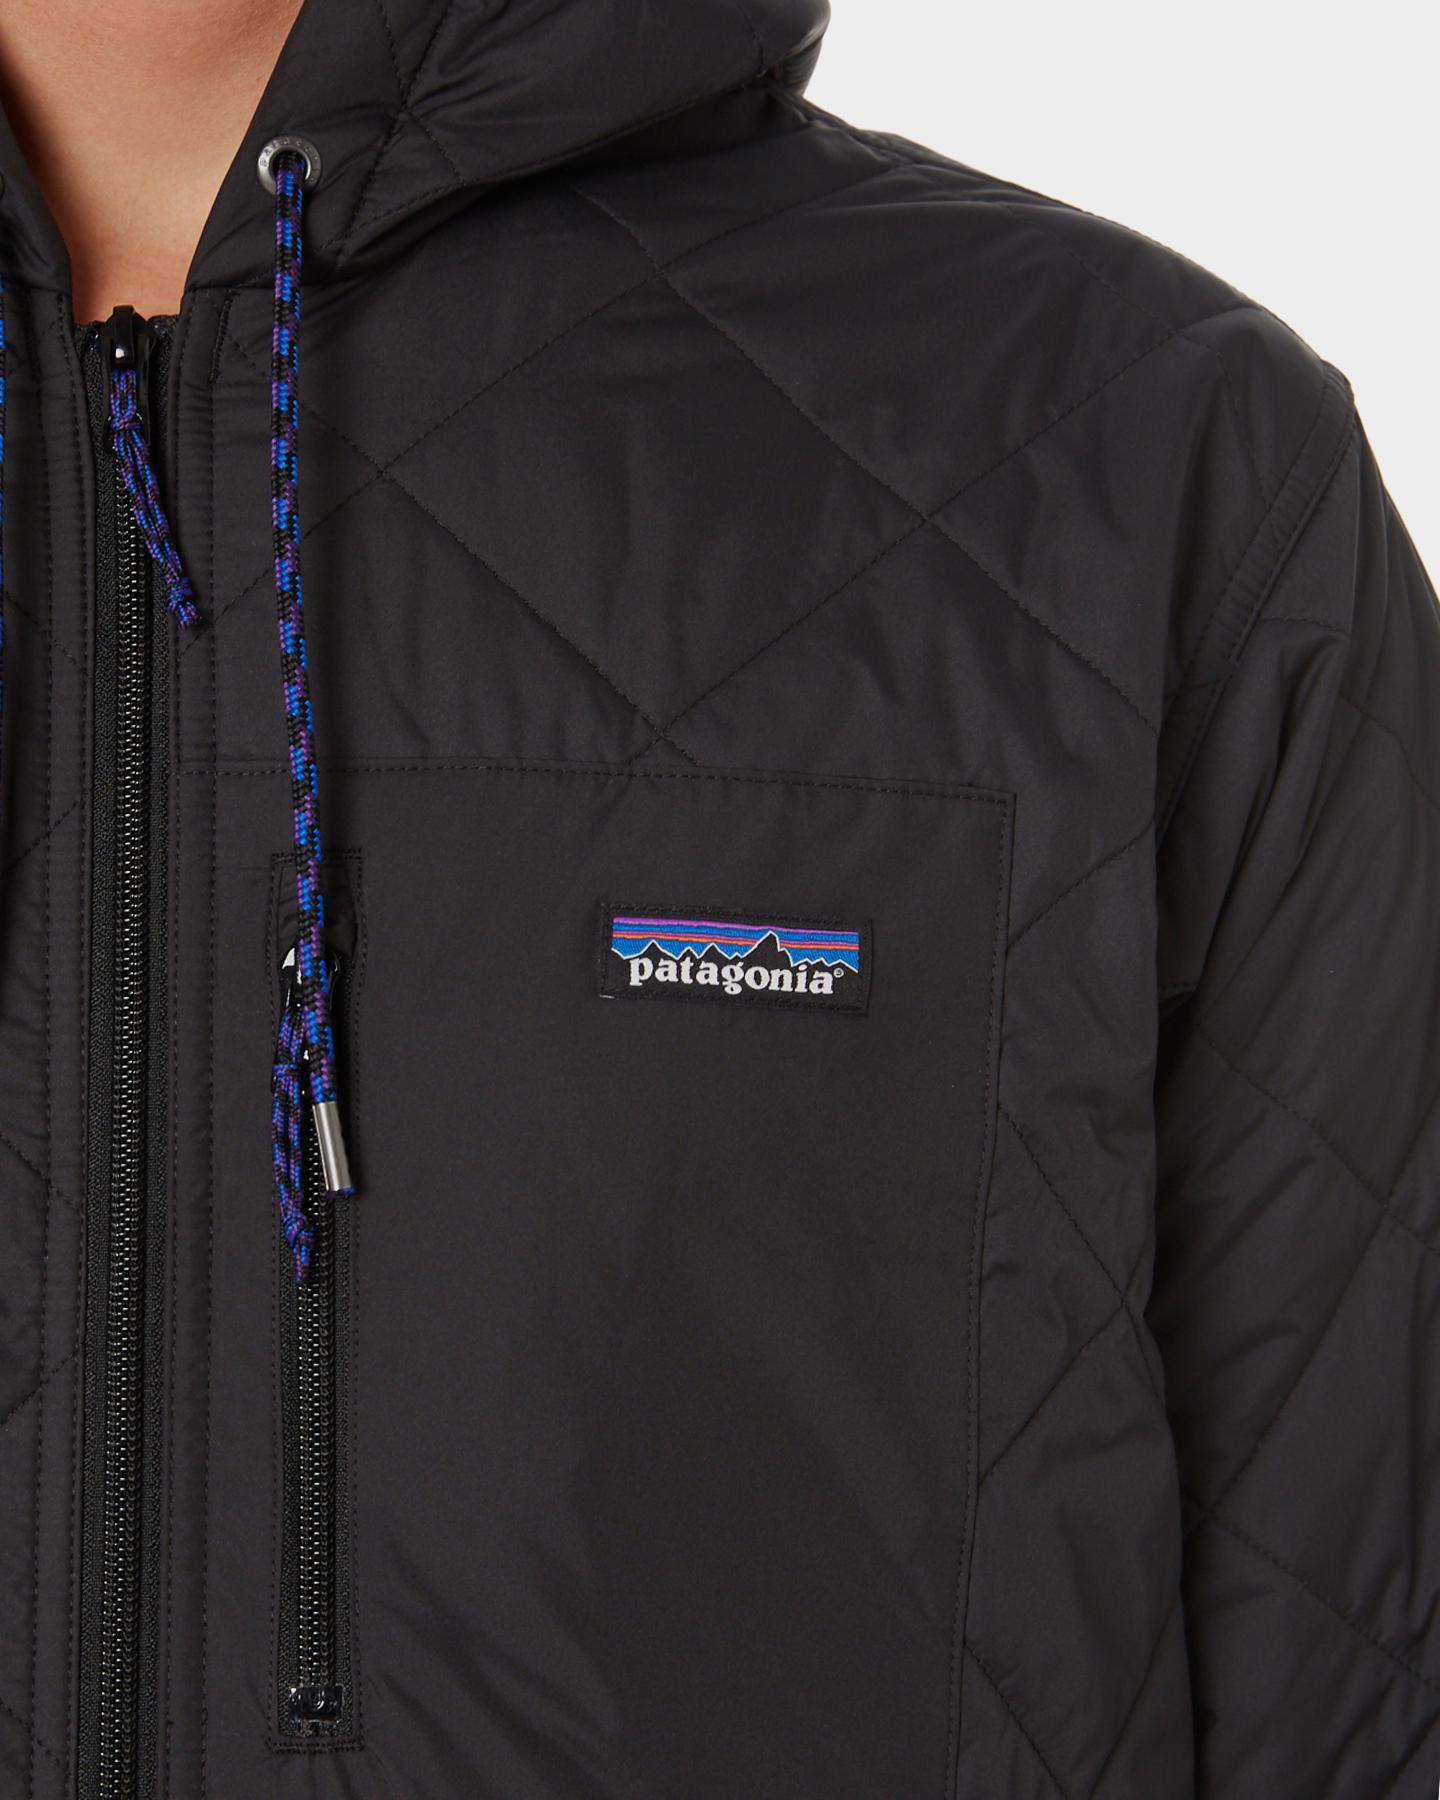 Patagonia Diamond Quilt Mens Bomber Jacket Black